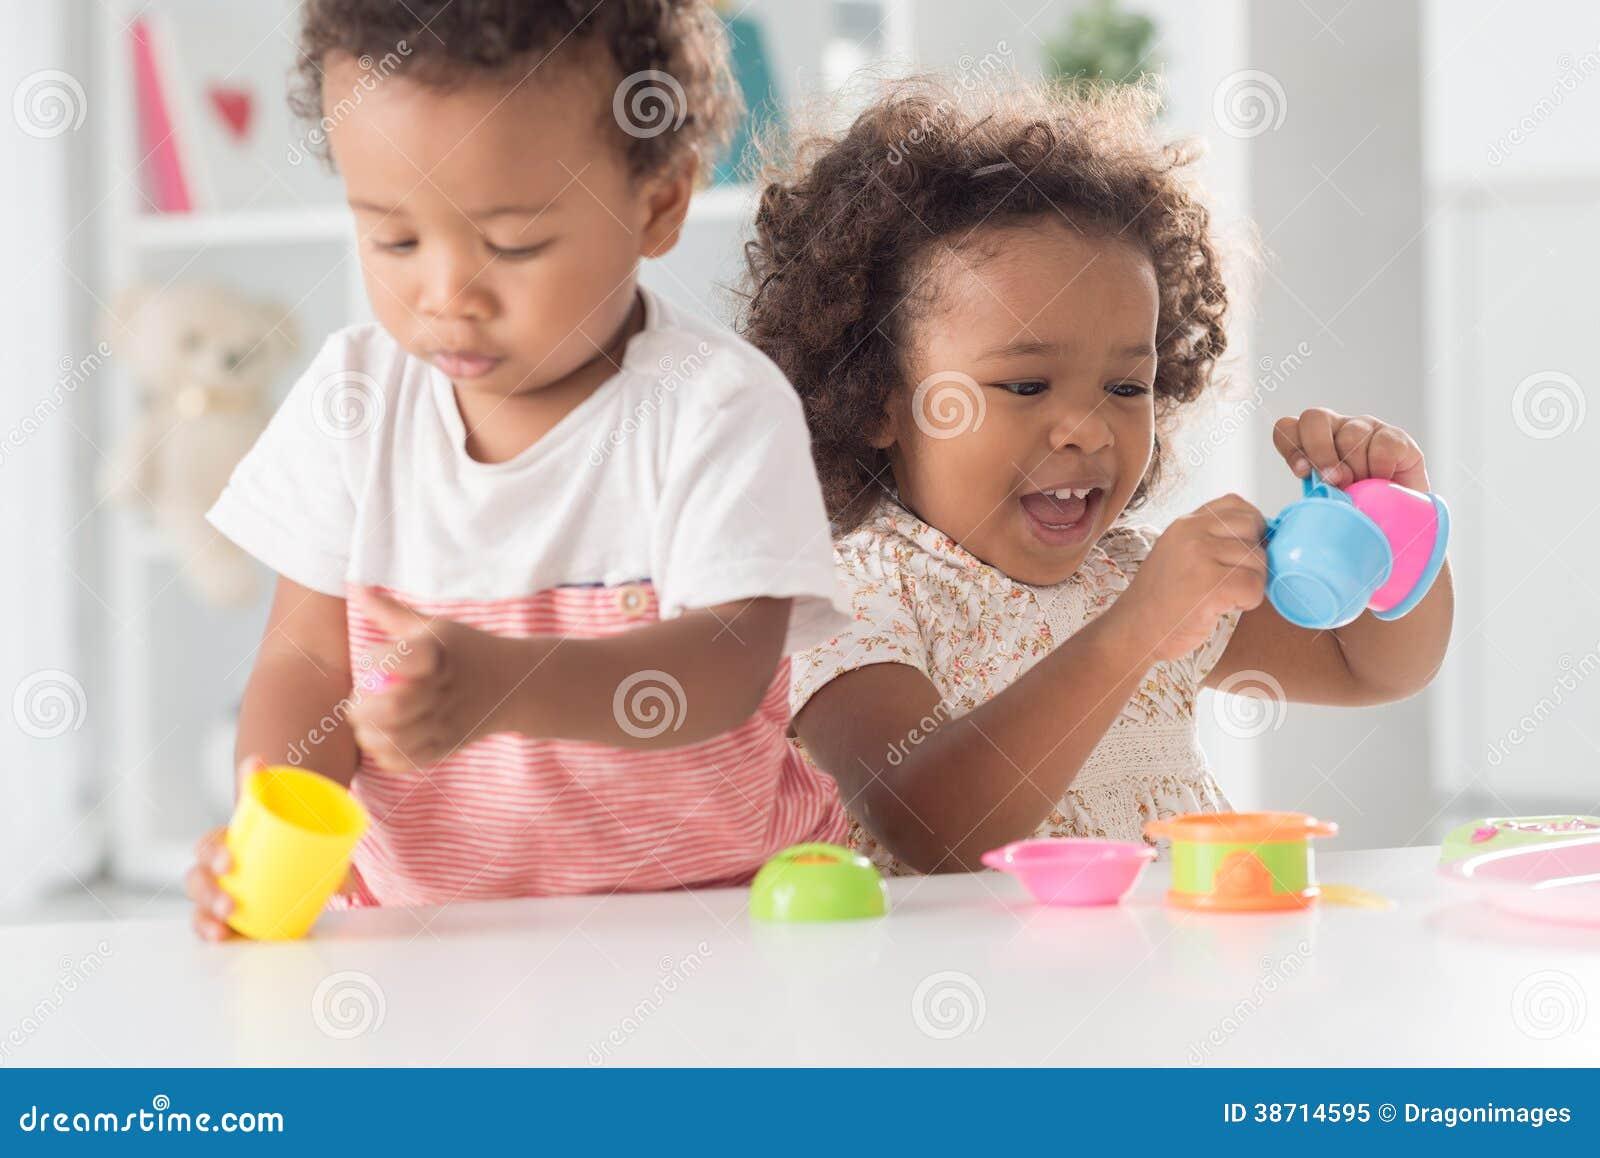 Cheerful playing